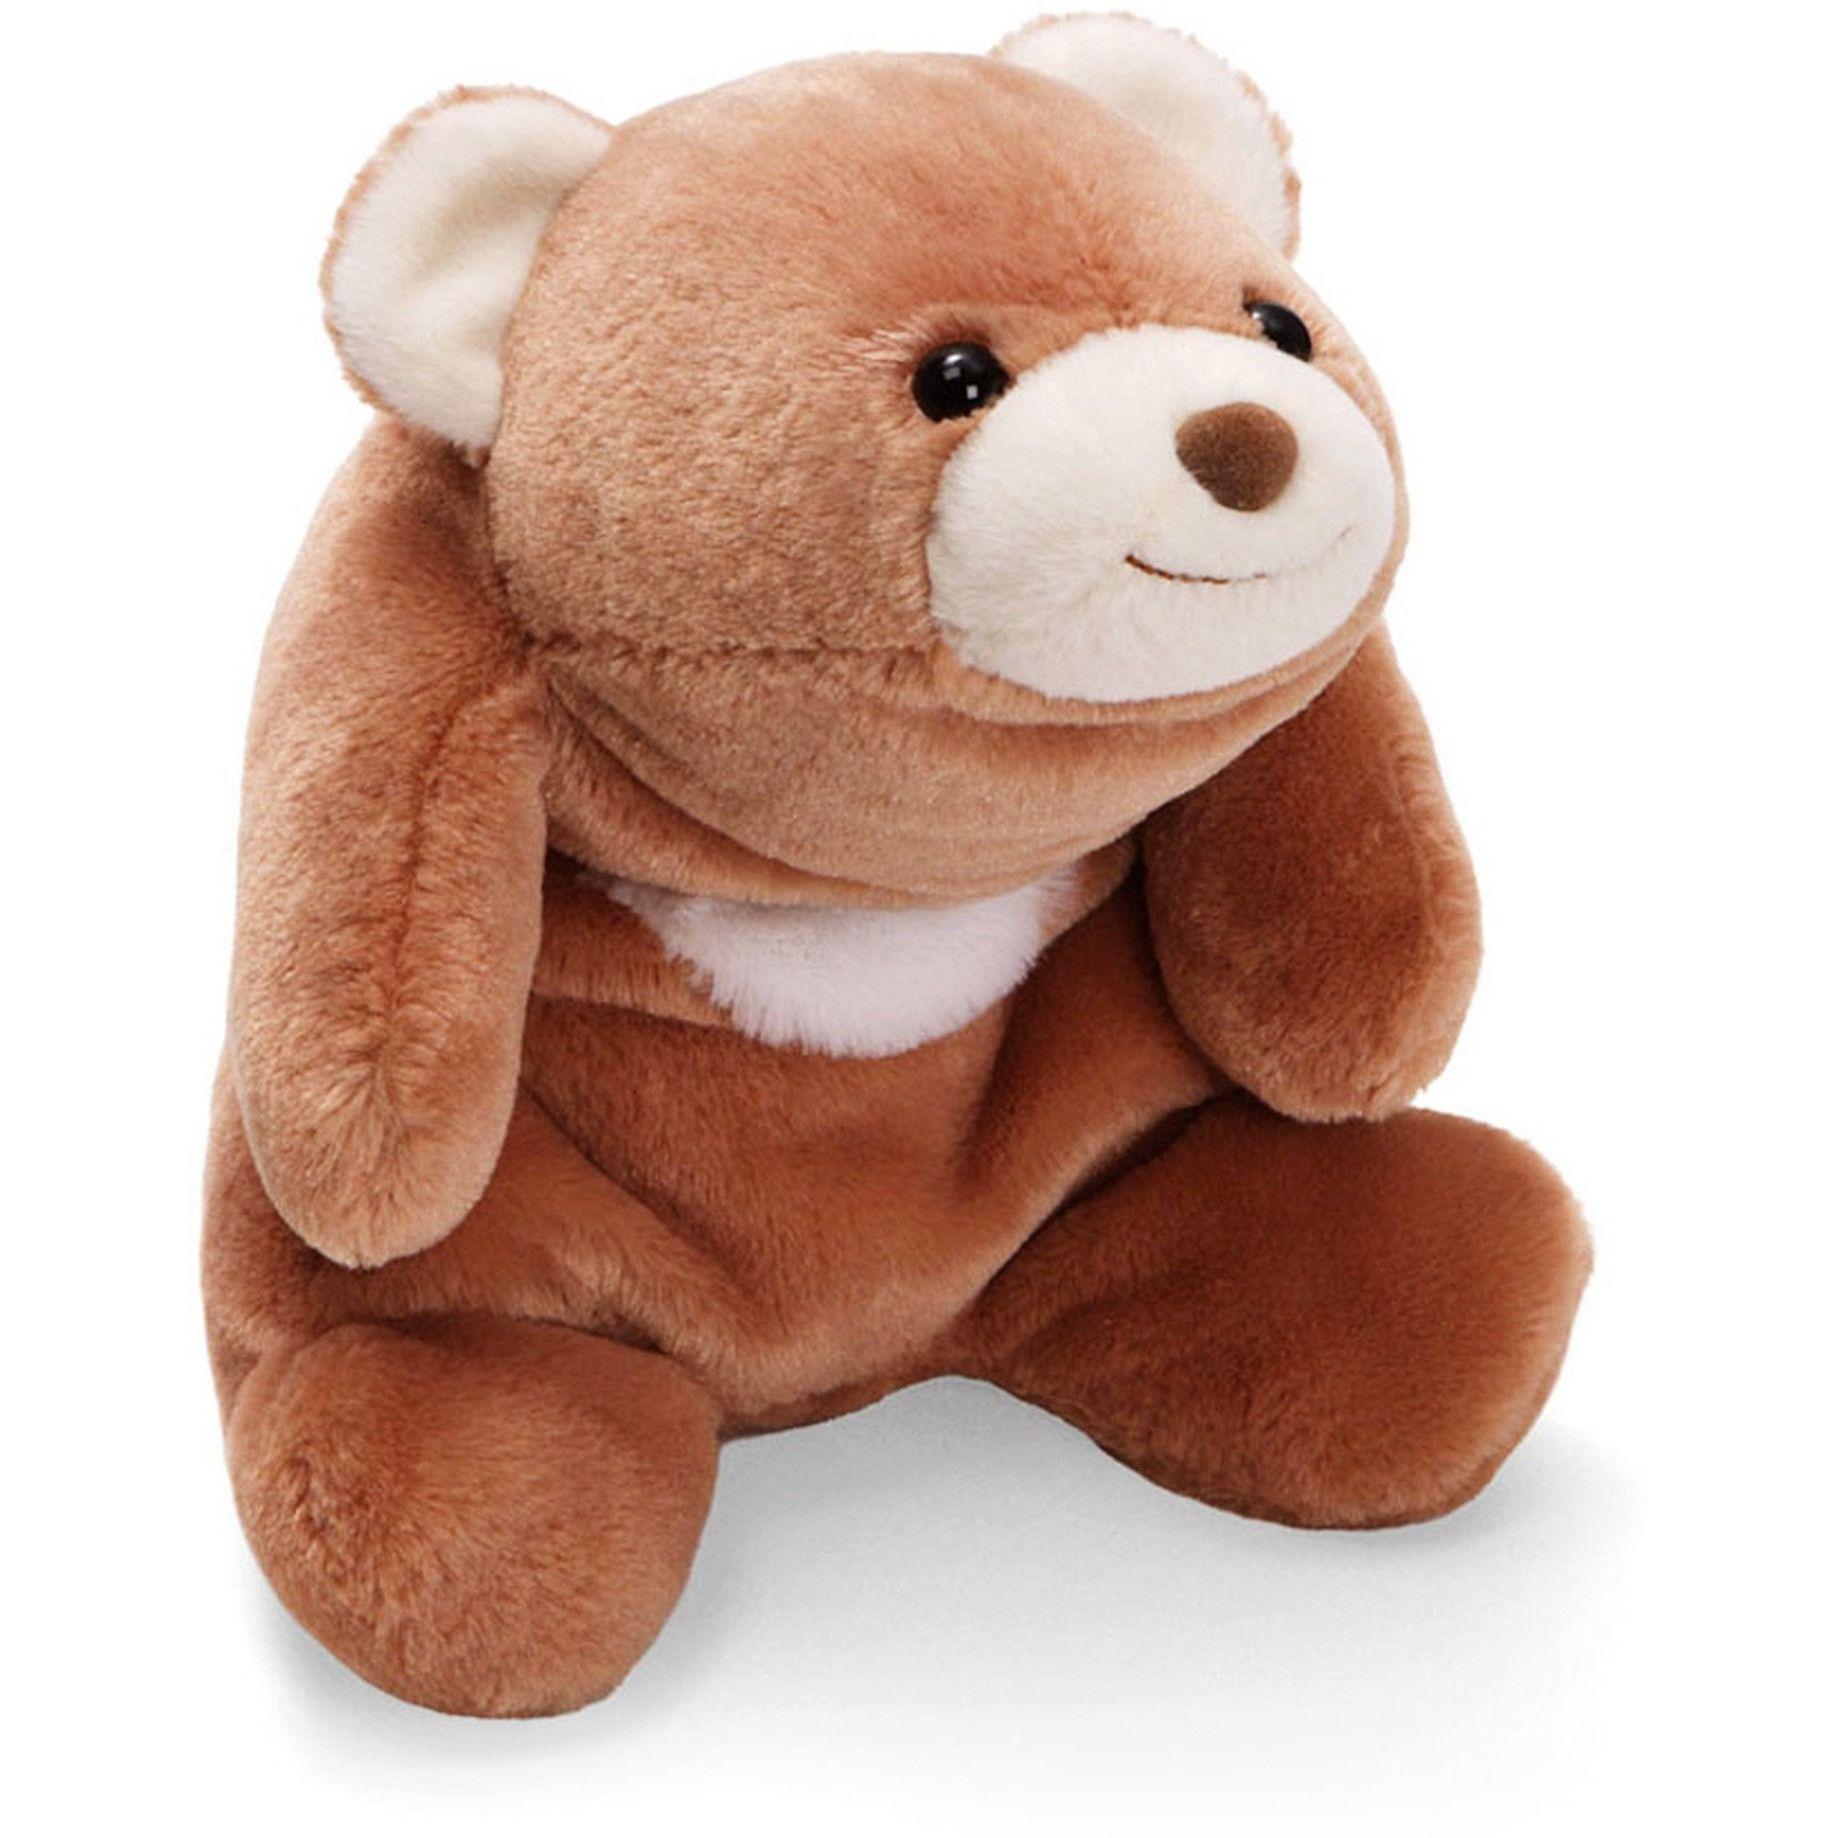 Plush Animal 10-in Rose Pink Sitting Snuffles Teddy Bear GUND